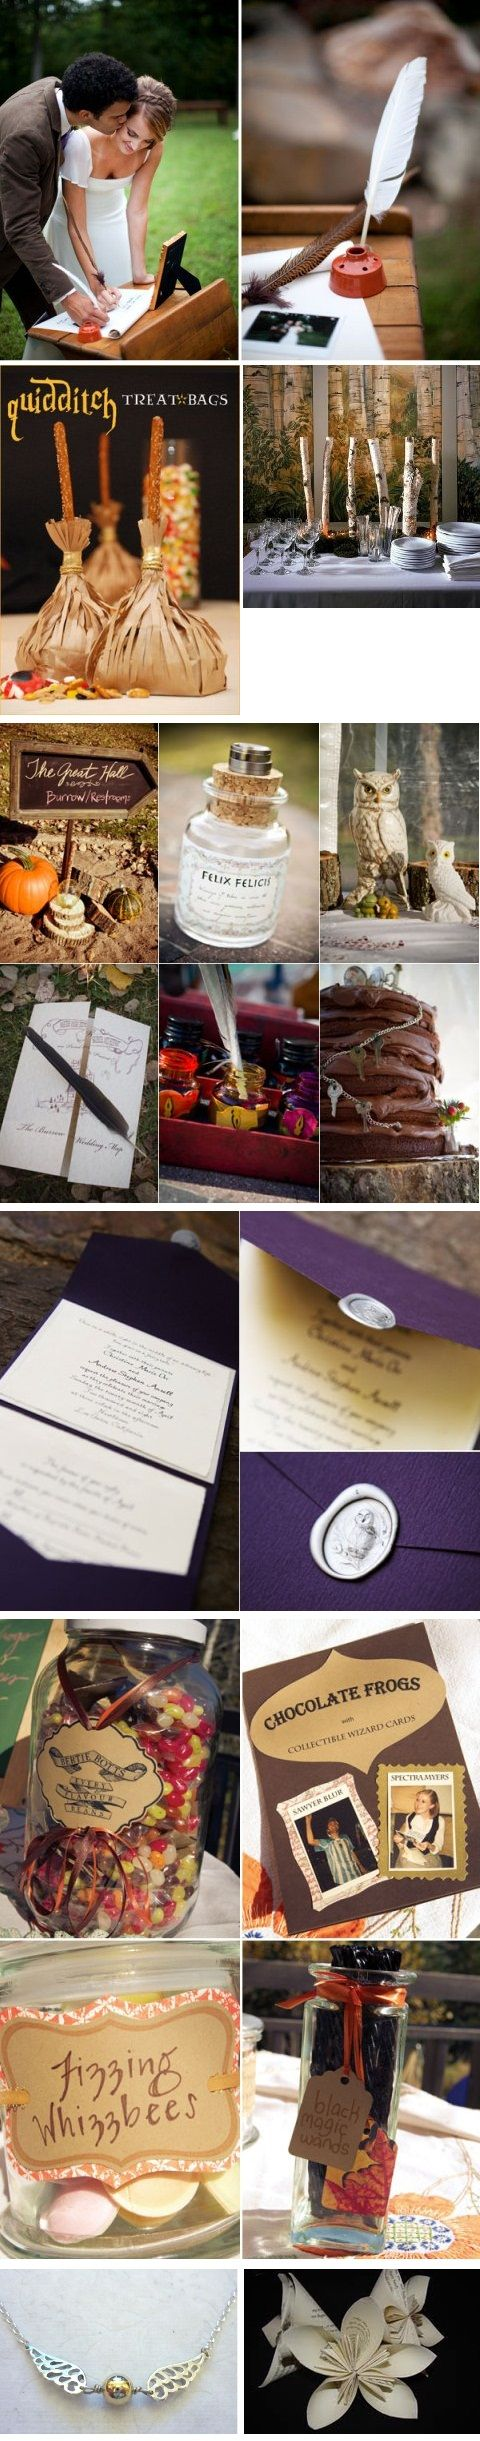 Harry Potter Wedding on http://itsabrideslife.com